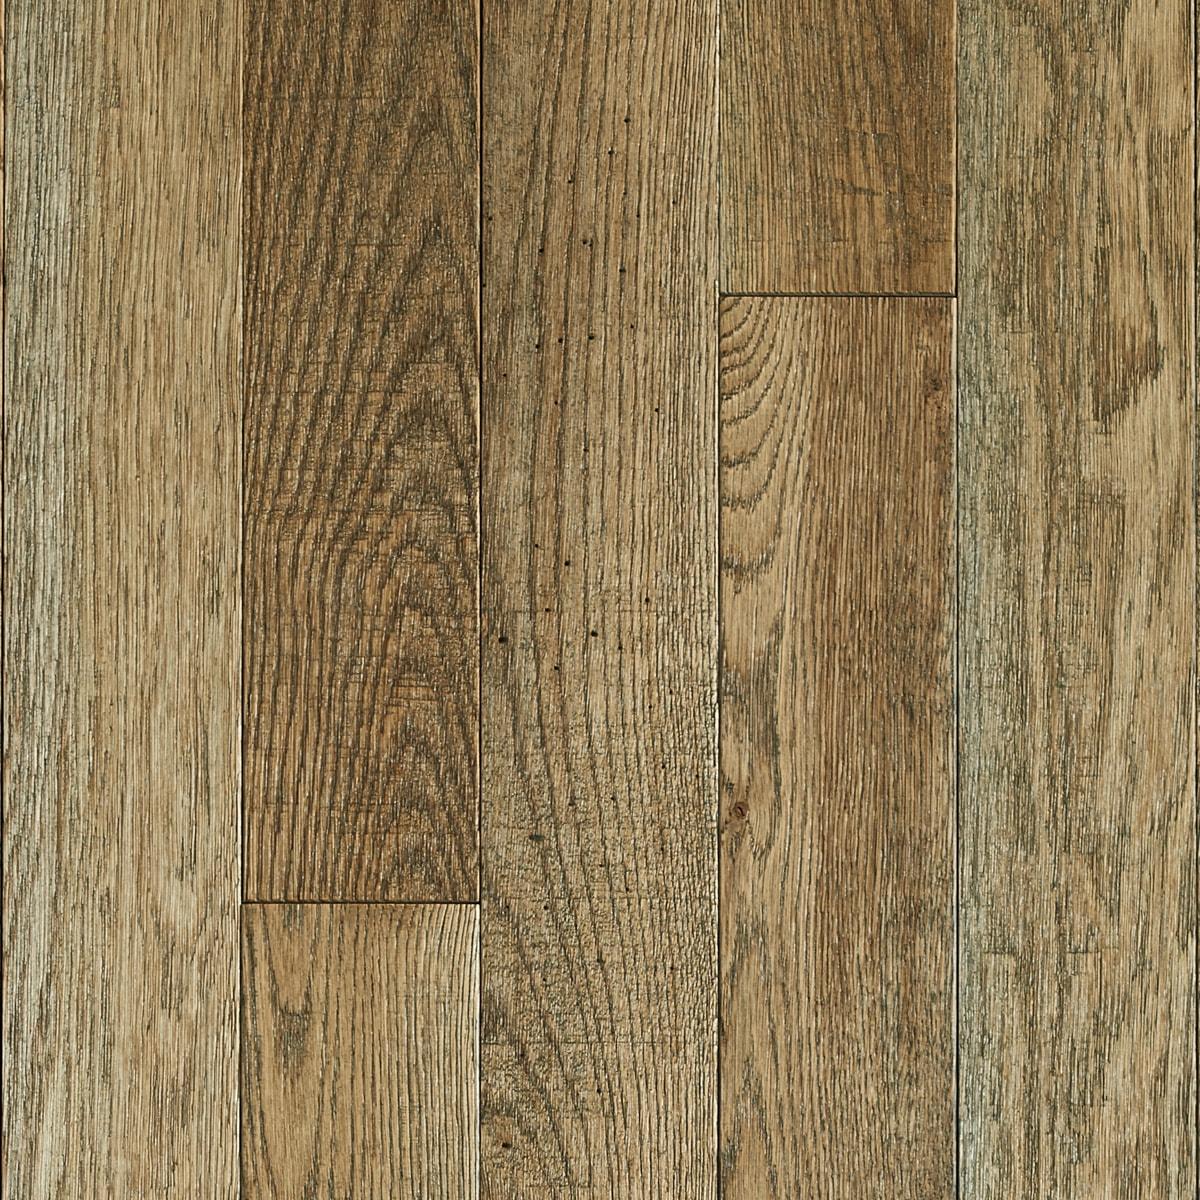 Brooke hardwood floor